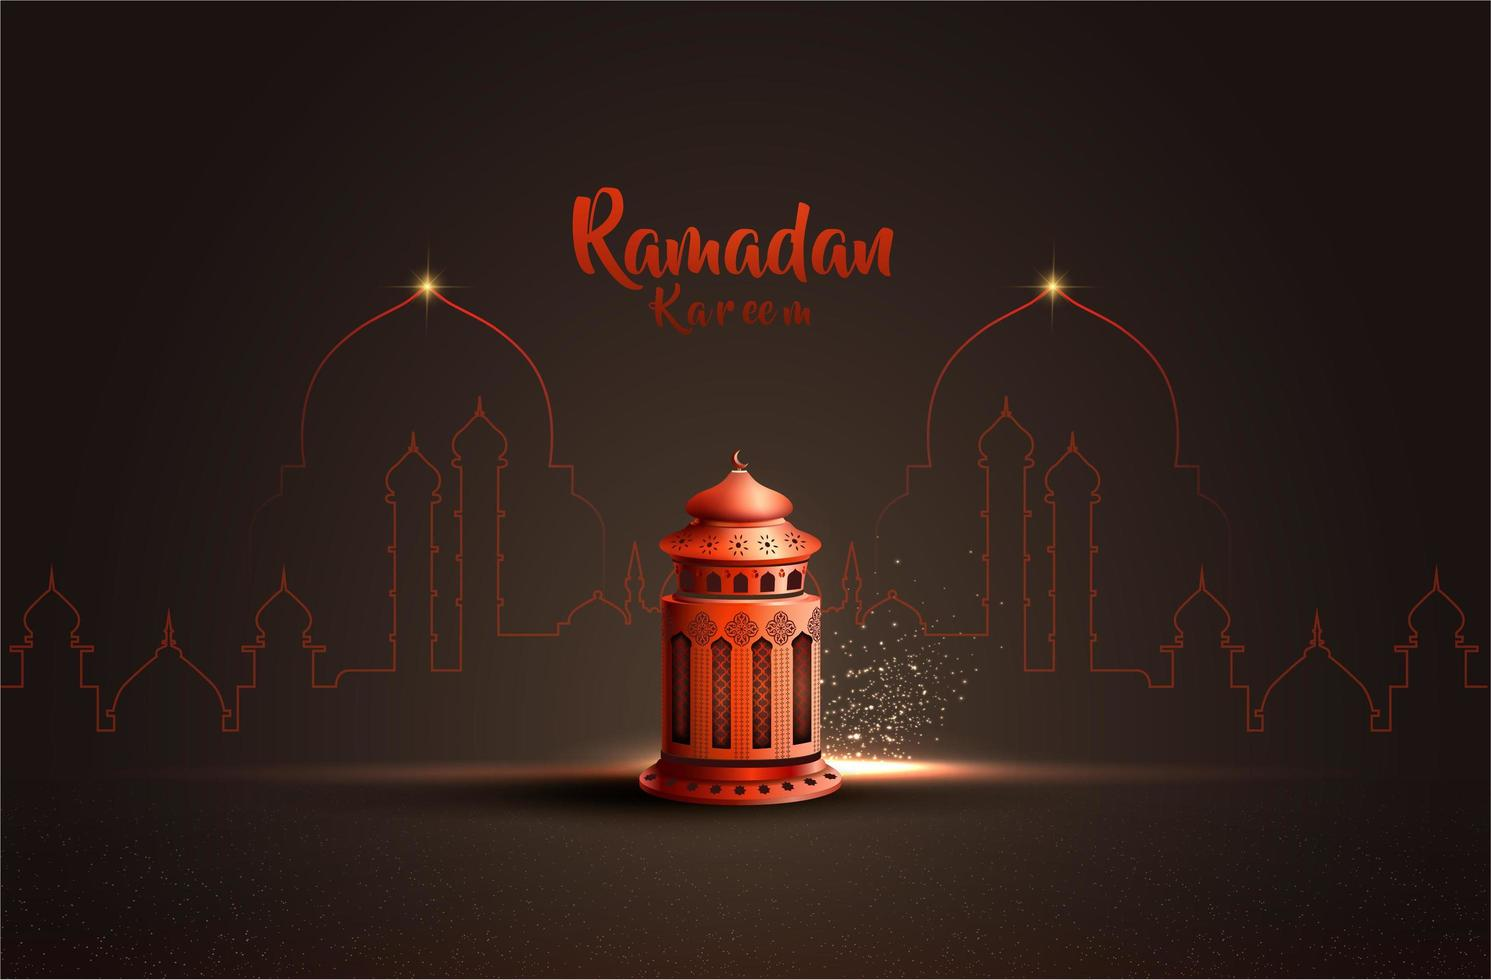 ramadan kaart met rode lantaarn vector